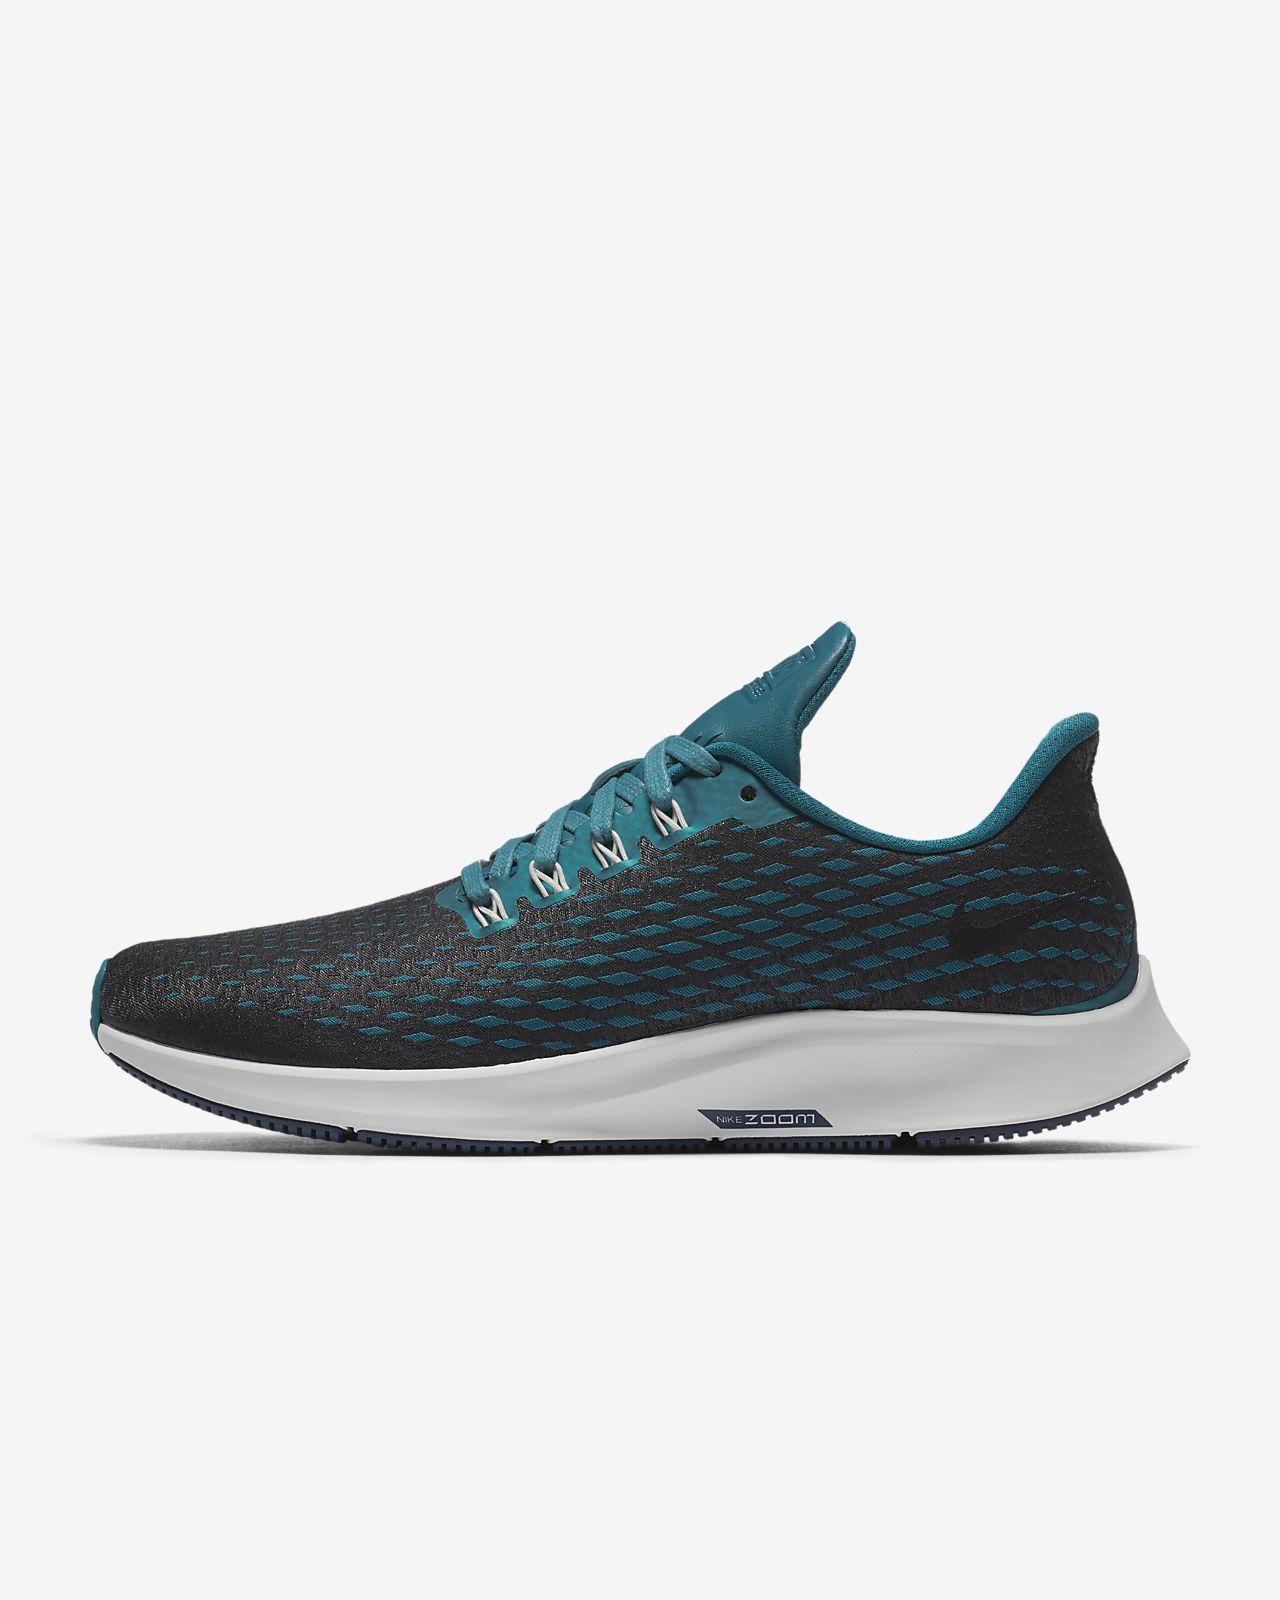 b473ed0352229 Nike Air Zoom Pegasus 35 Premium Women s Running Shoe. Nike.com